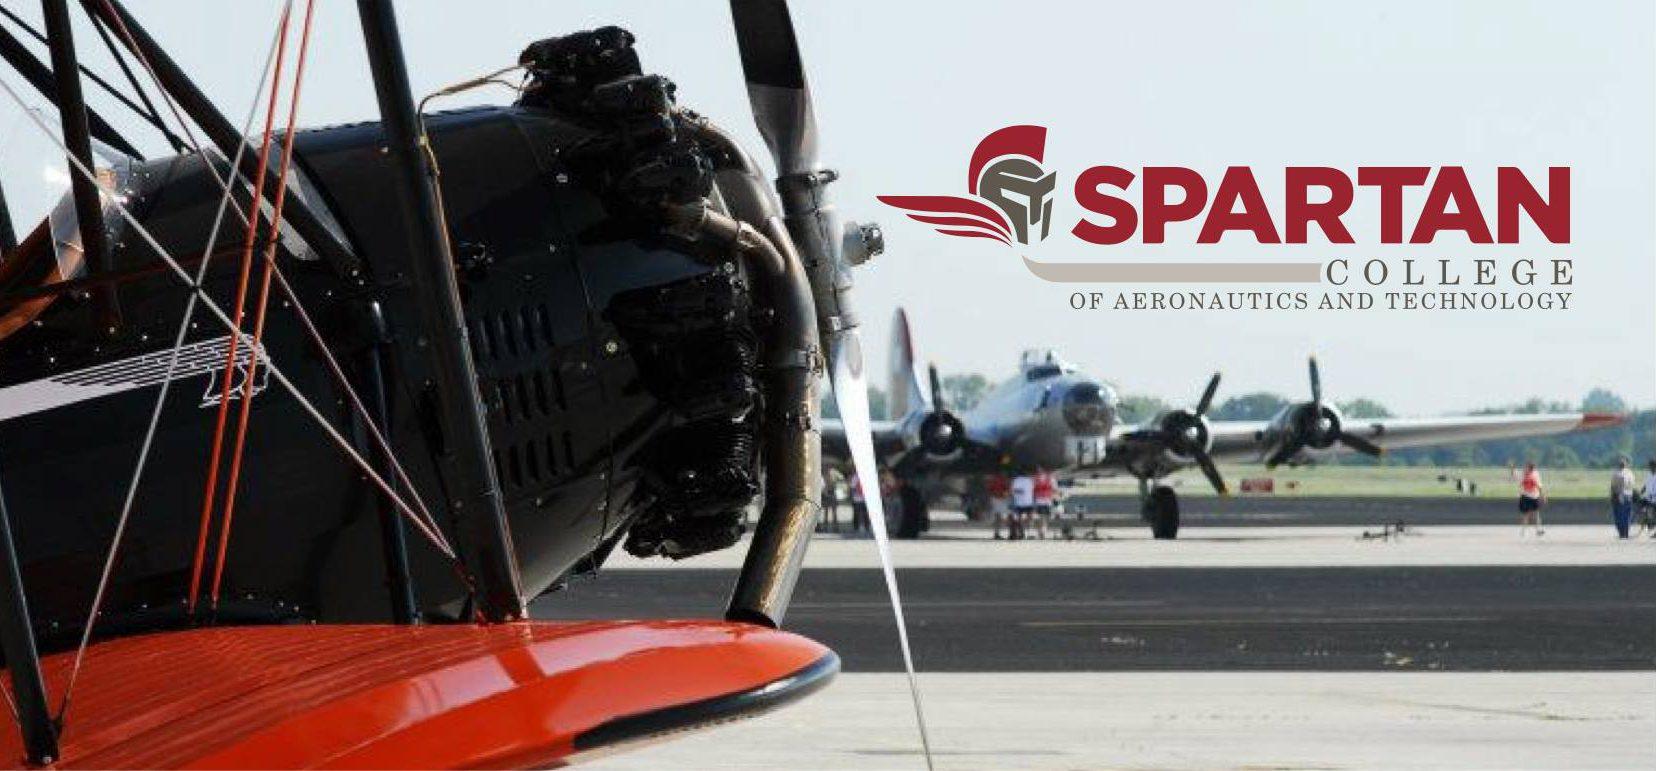 spartan college of aeronautics and technology spring